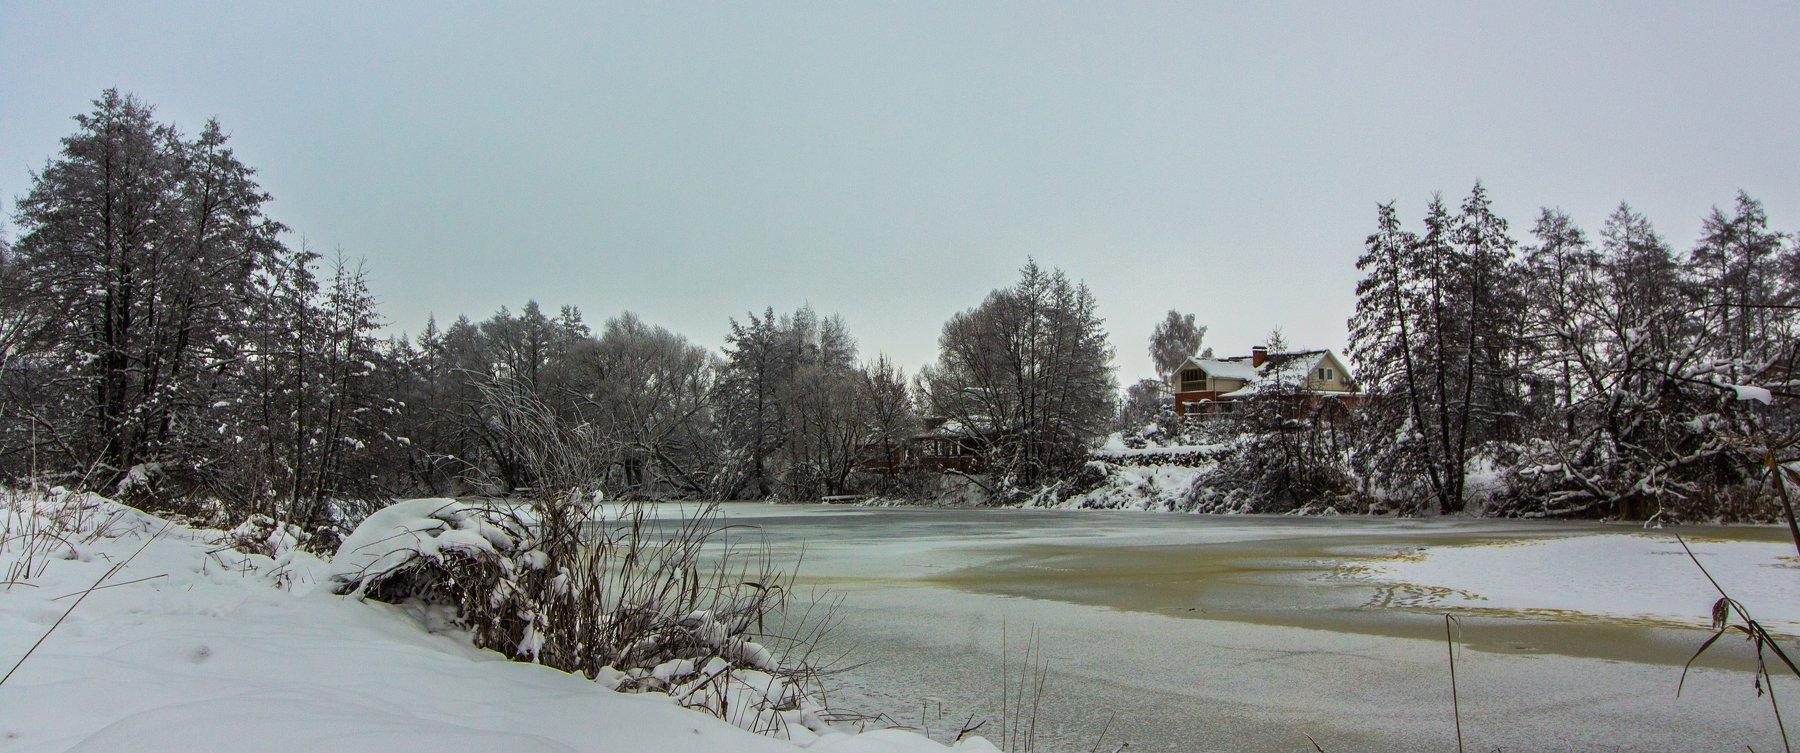 деревня, природа, лес, река, усмань, терновка, Руслан Востриков